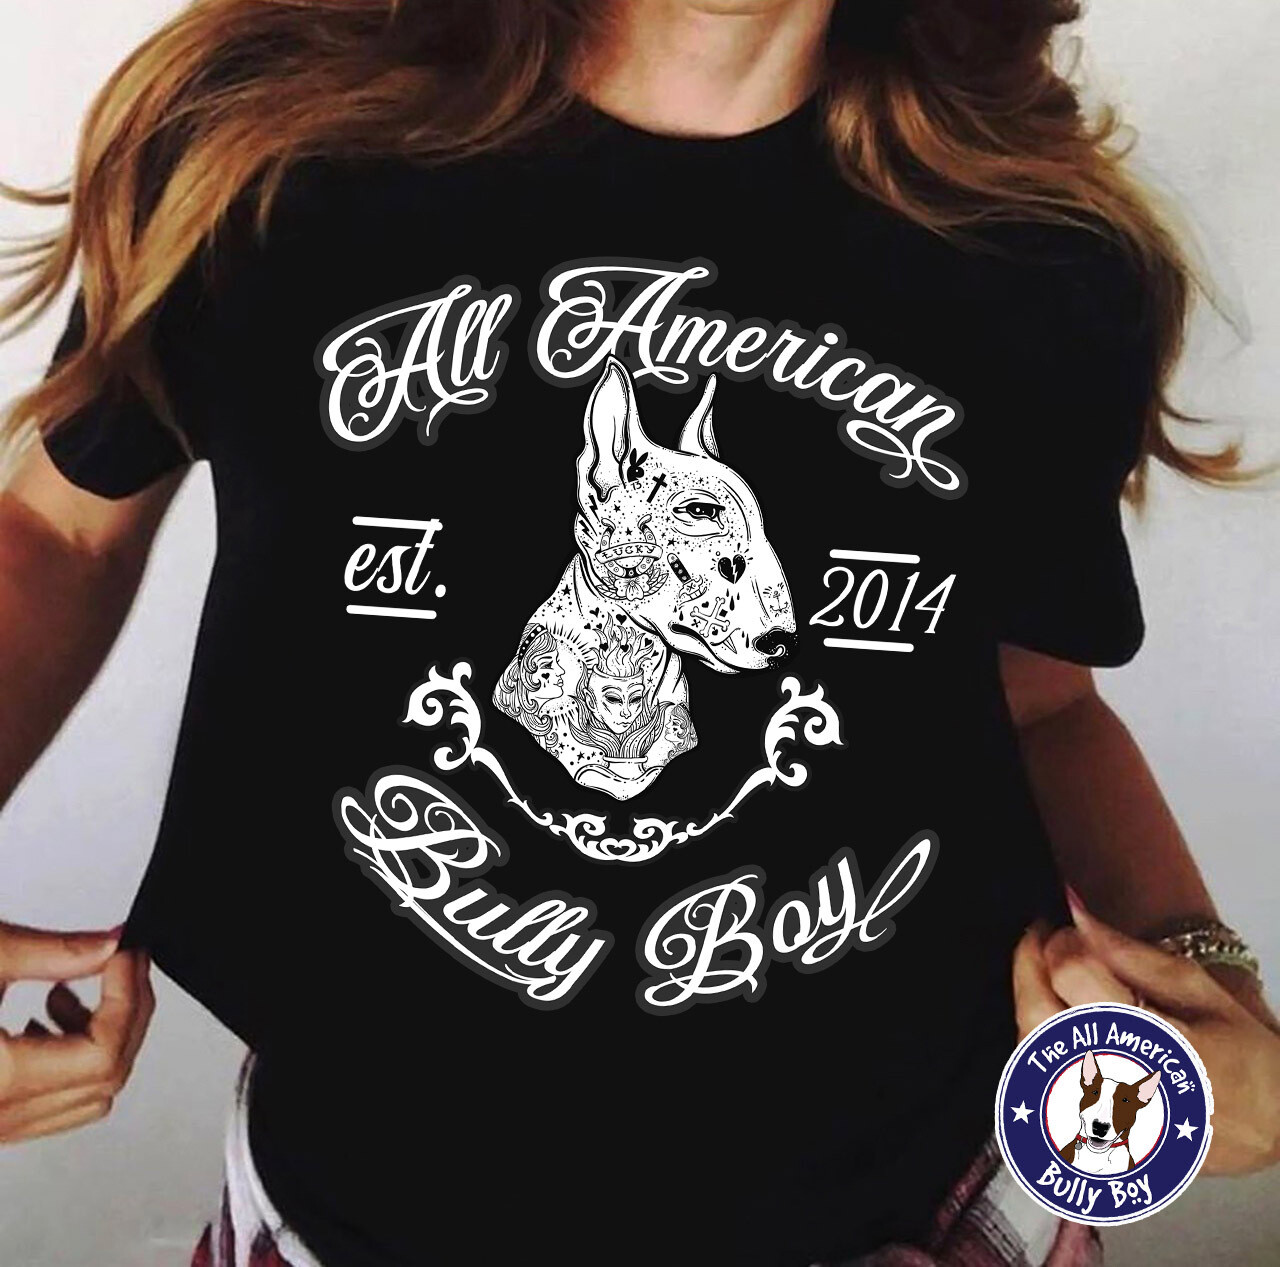 Bully Boy Tattoo - Tee Shirt - Free Shipping